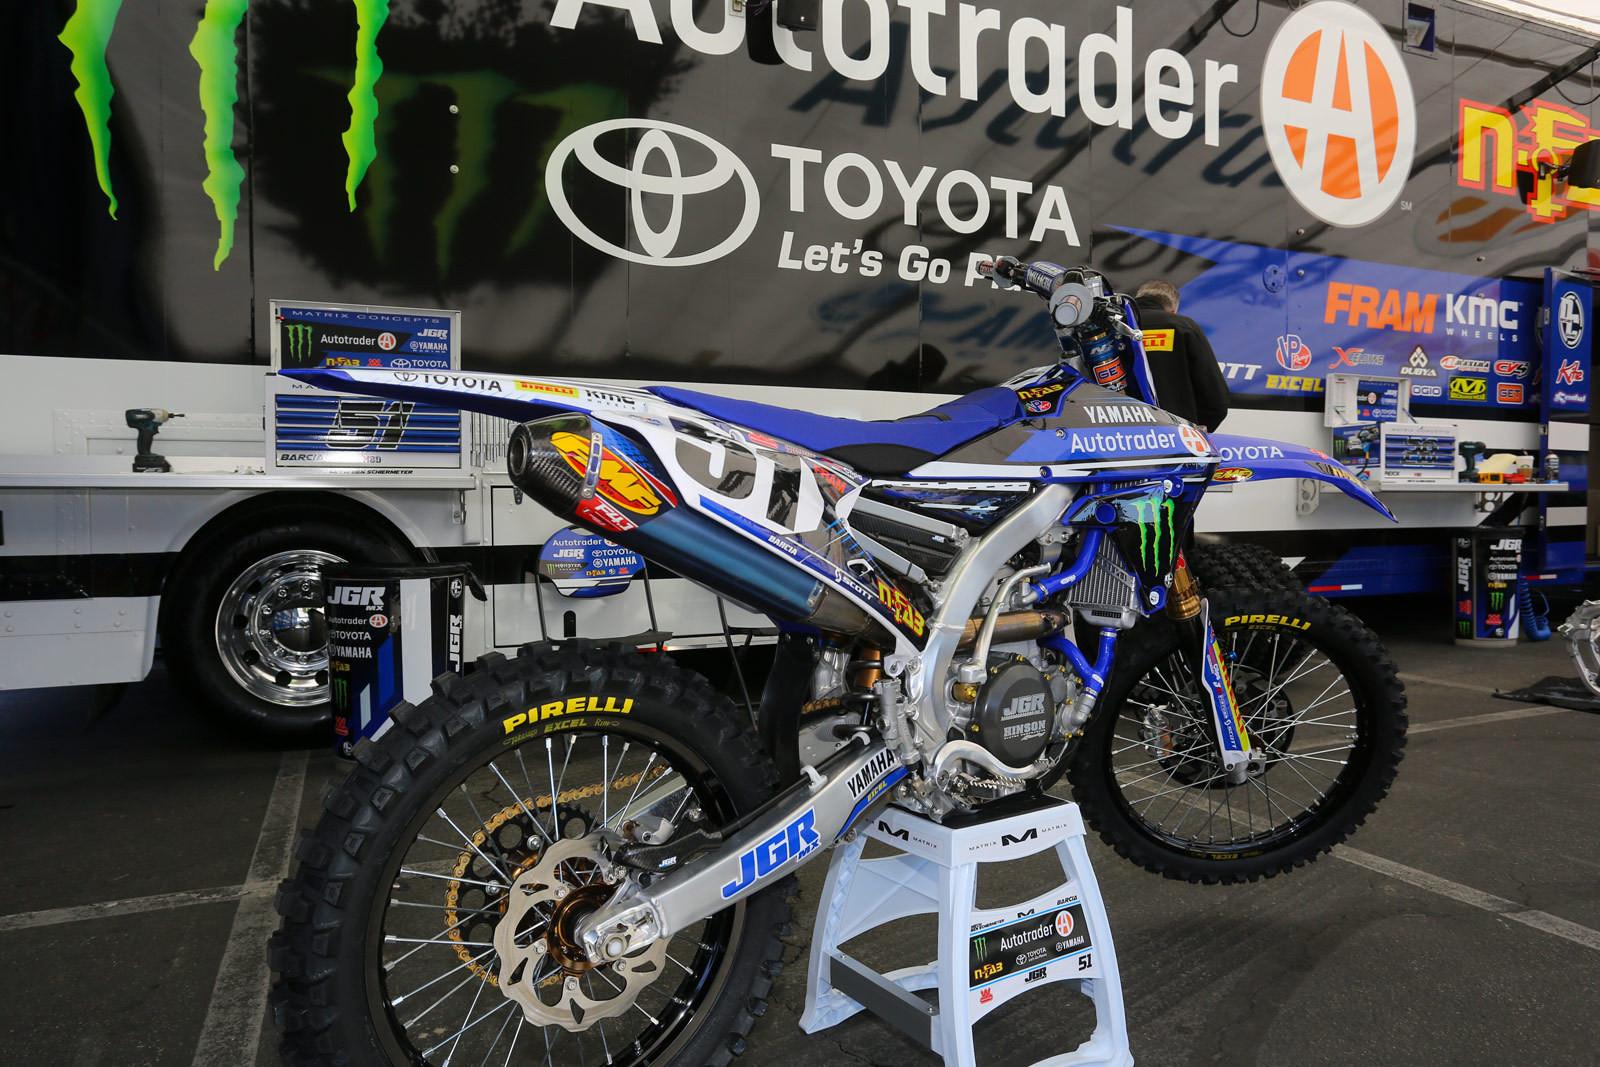 Justin Barcia - 2016 Bikes of Supercross - Motocross Pictures - Vital MX